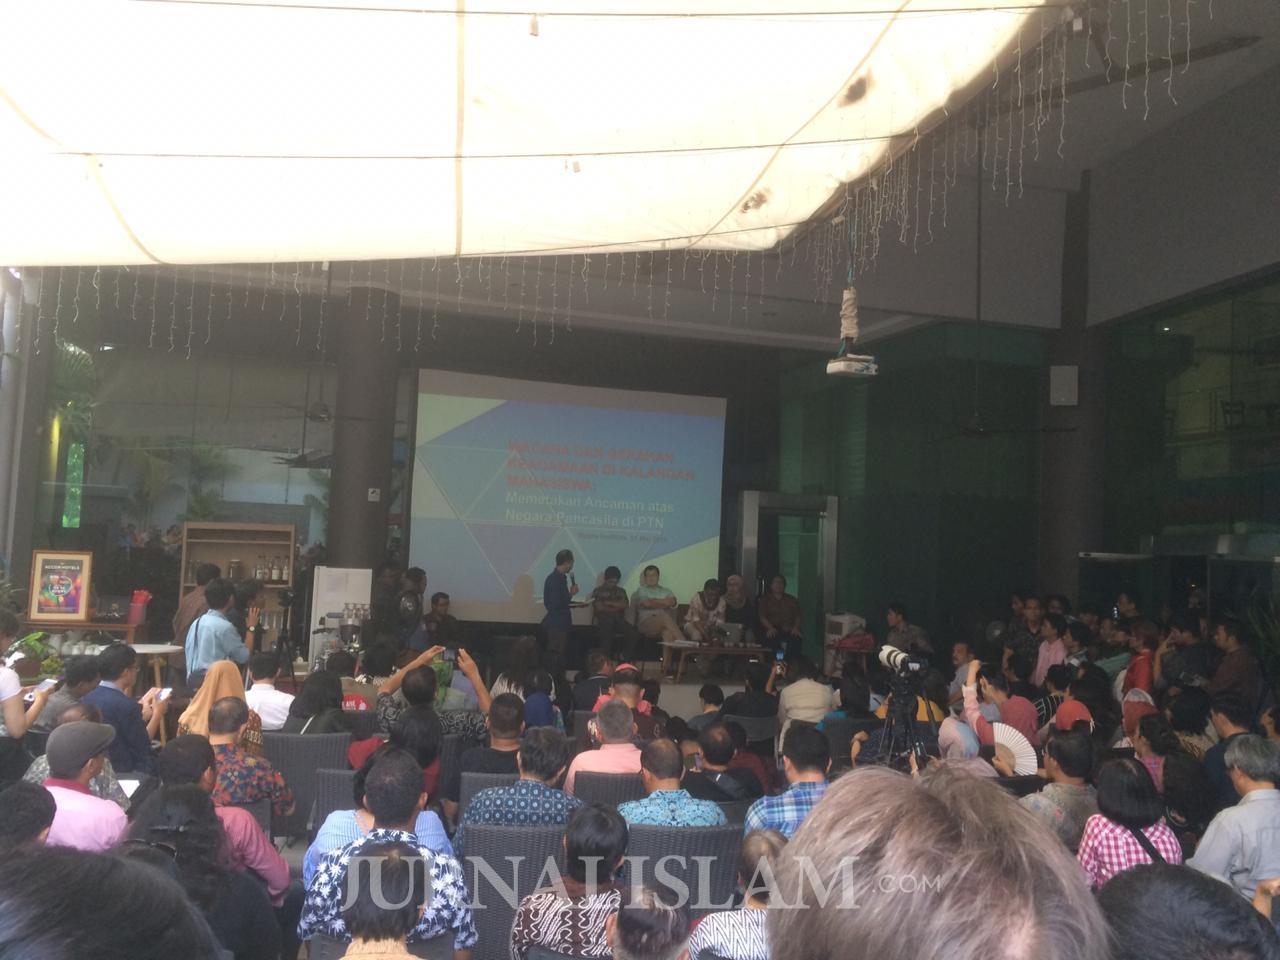 Setara Institute: Pembubaran HTI Tak Meredam Gerakan Islam di Kampus